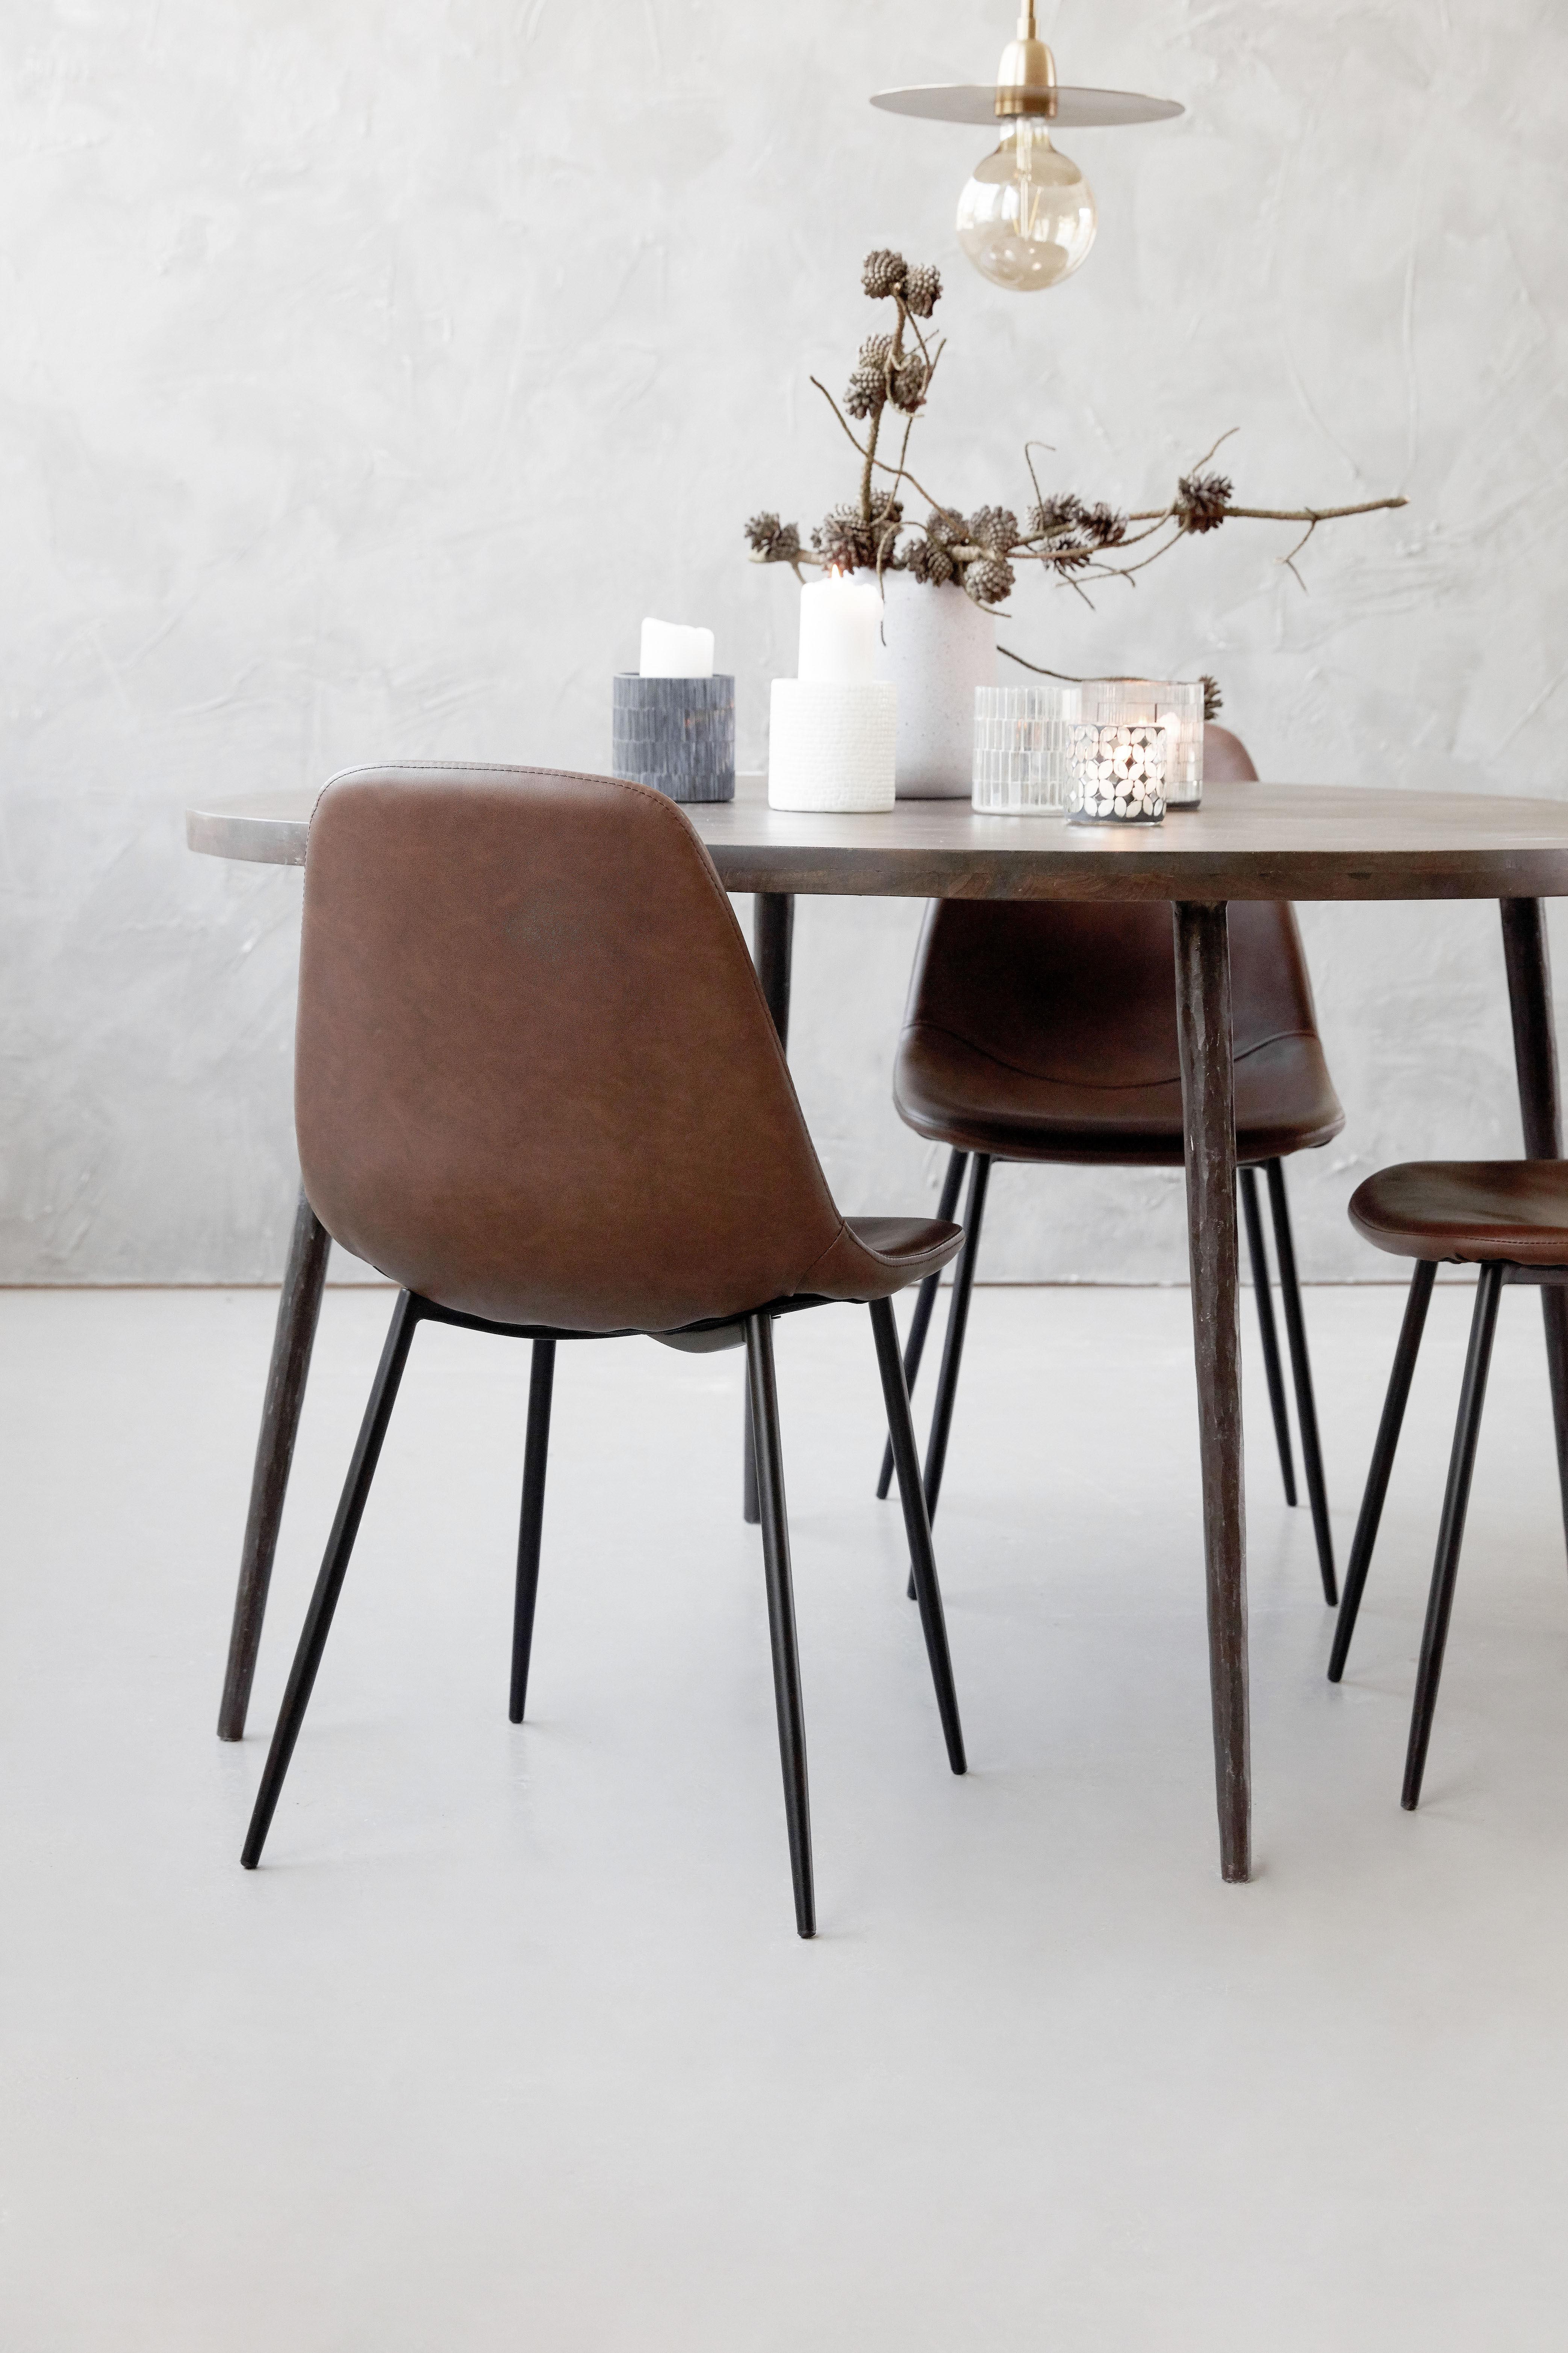 Forms sedia imbottita similpelle acciaio marrone by for Sedia design marrone